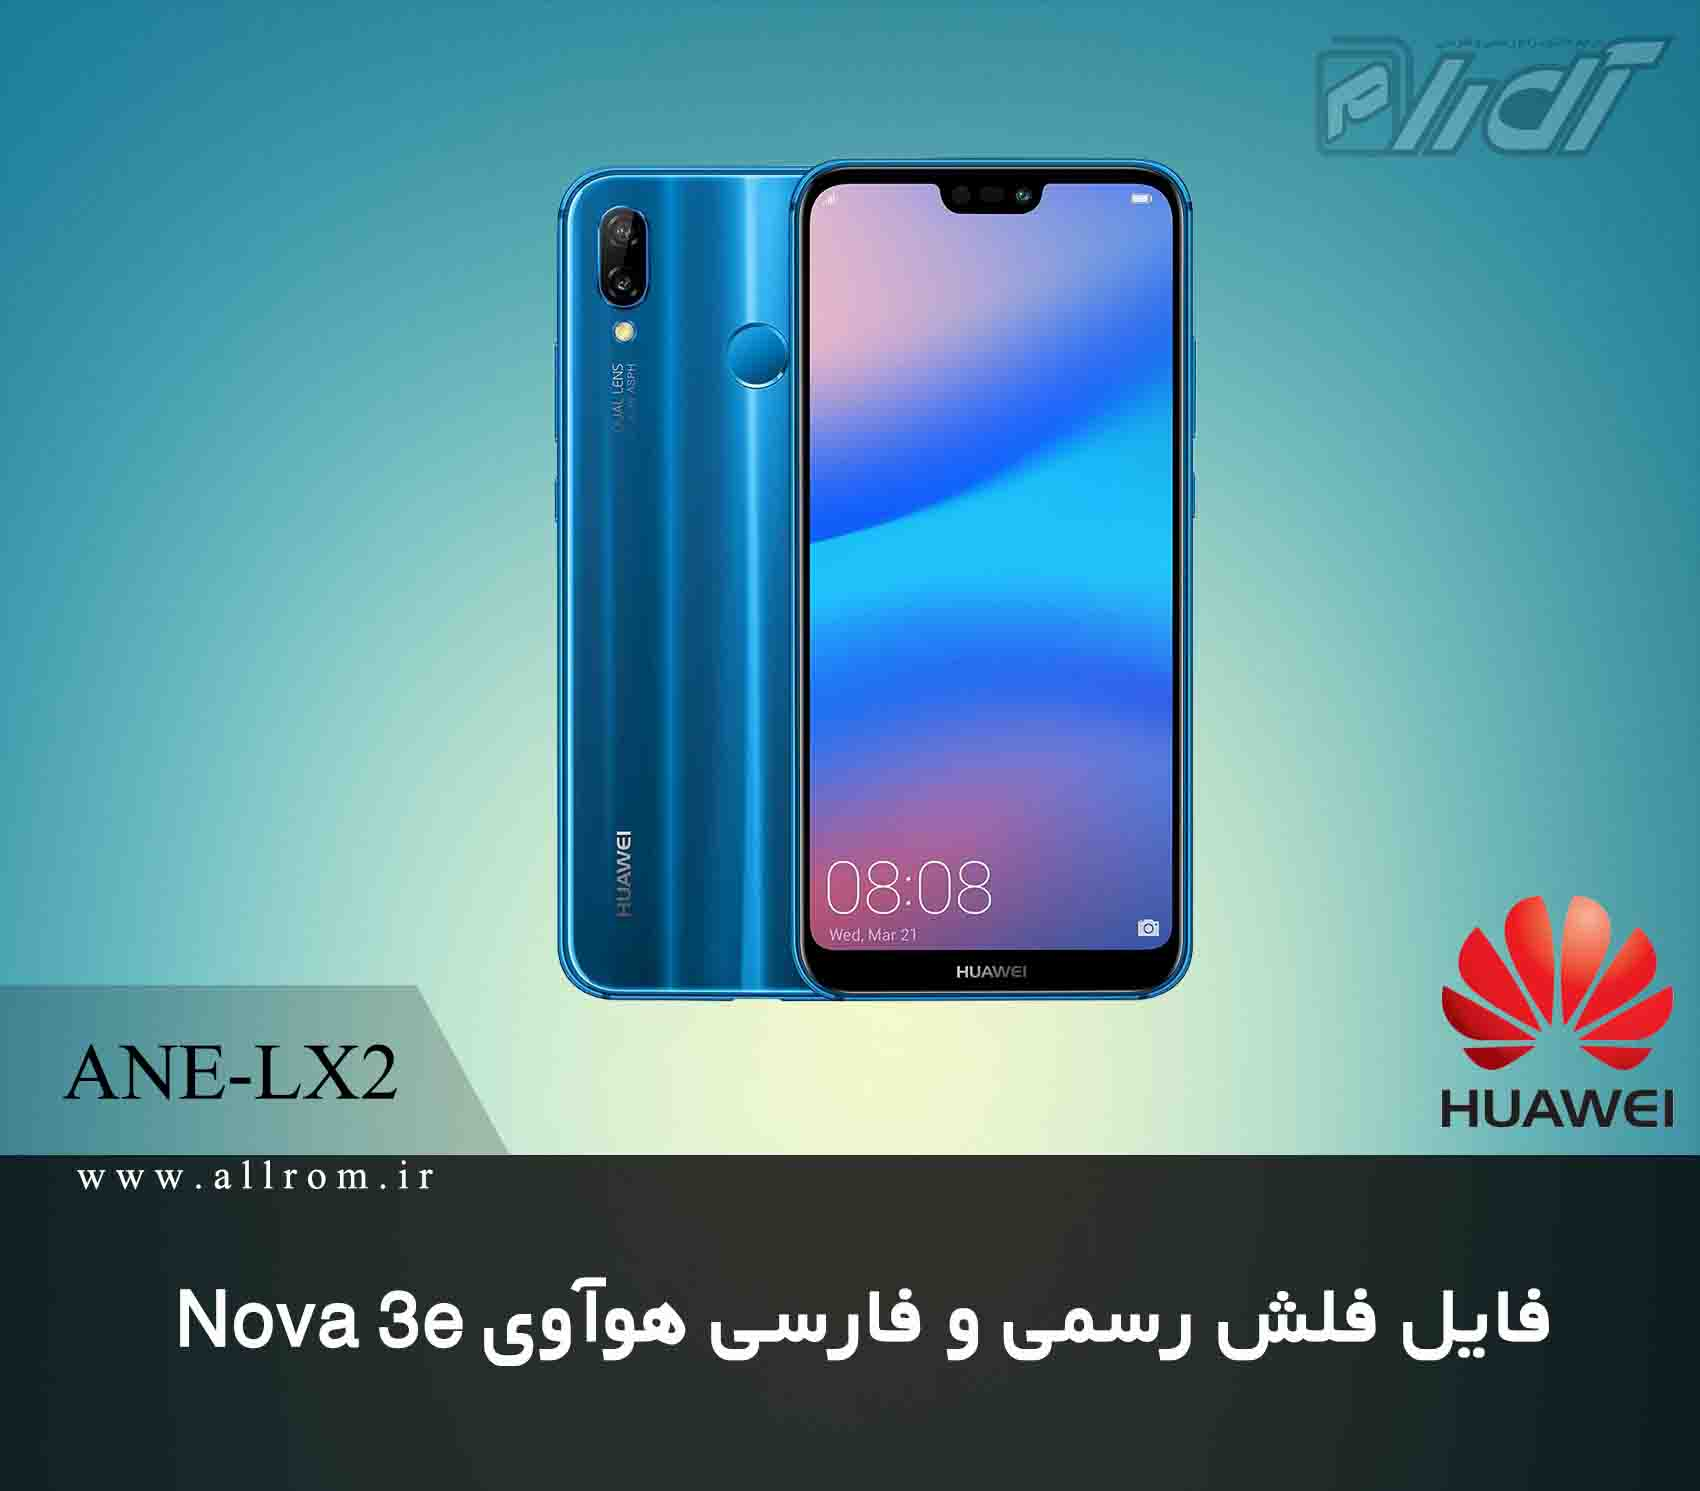 دانلود رام Huawei-Huawei Nova 3e ANE-LX2 P20 Lite